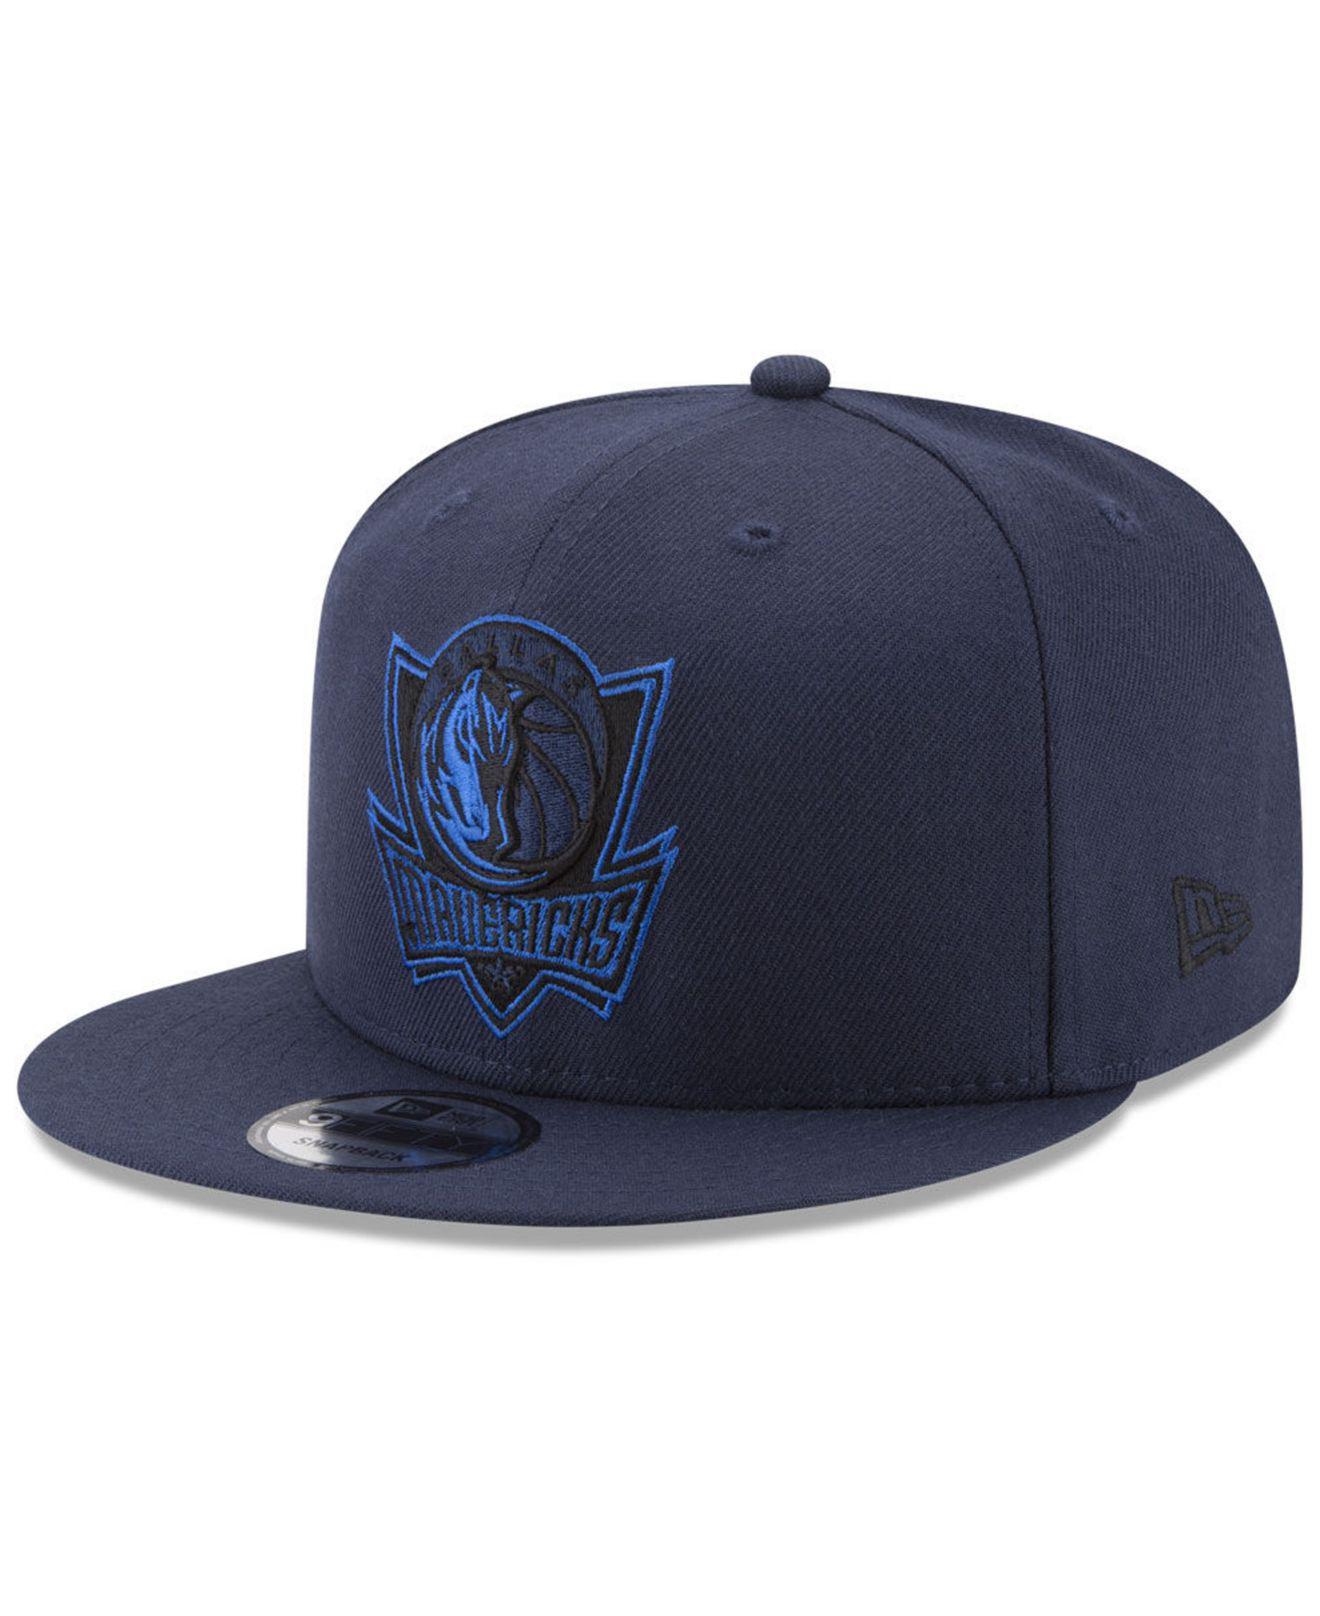 df222adcb46 Lyst - Ktz Dallas Mavericks All Colors 9fifty Snapback Cap in Blue ...